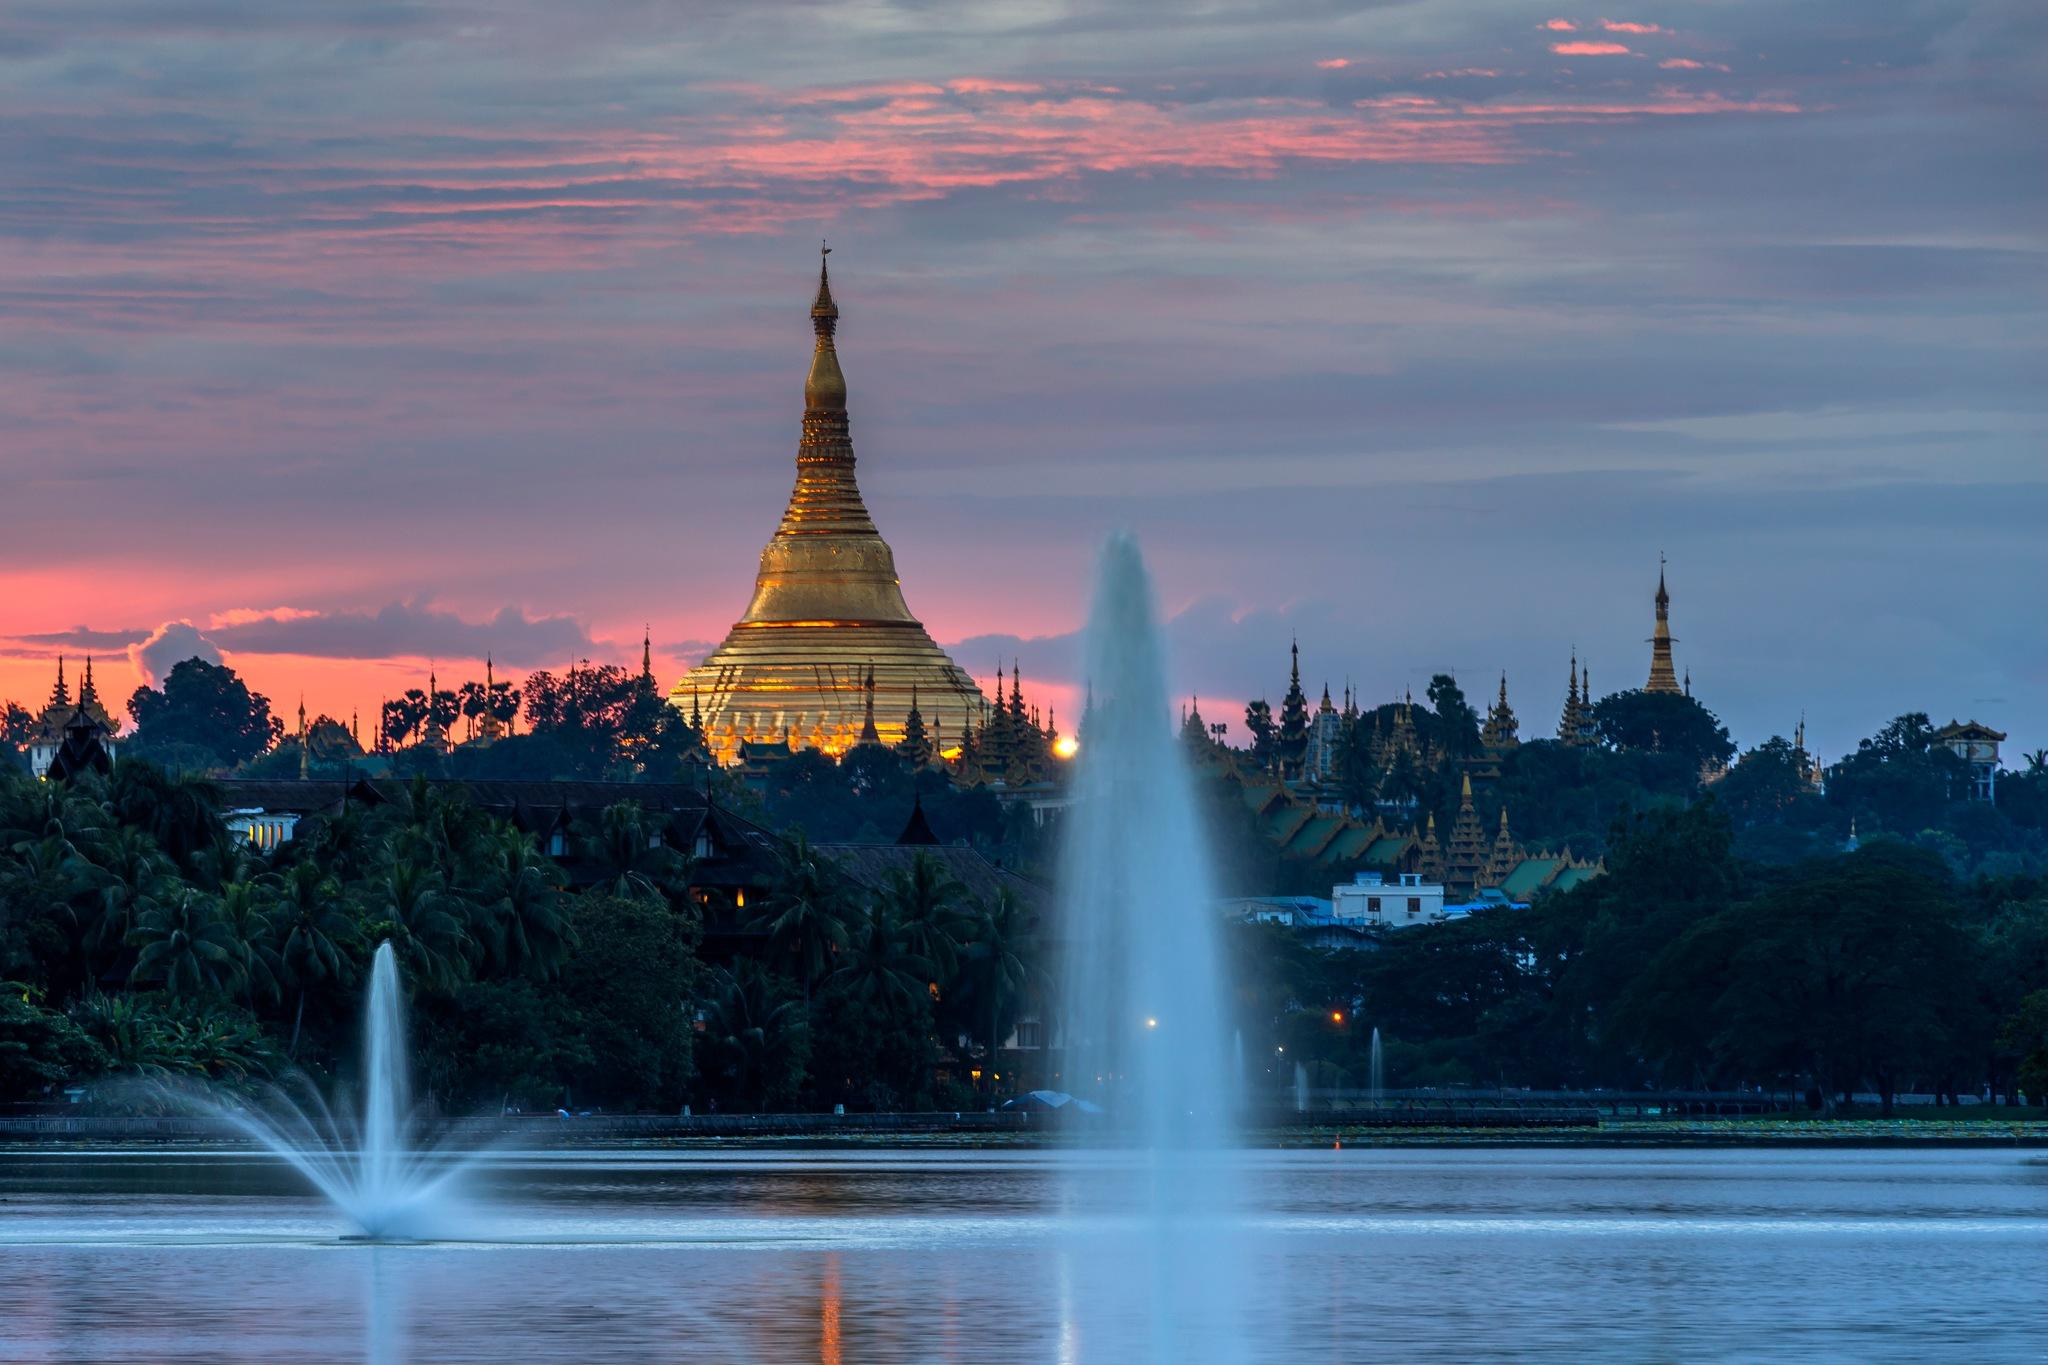 Shwedagon Pagoda by Htet Aung